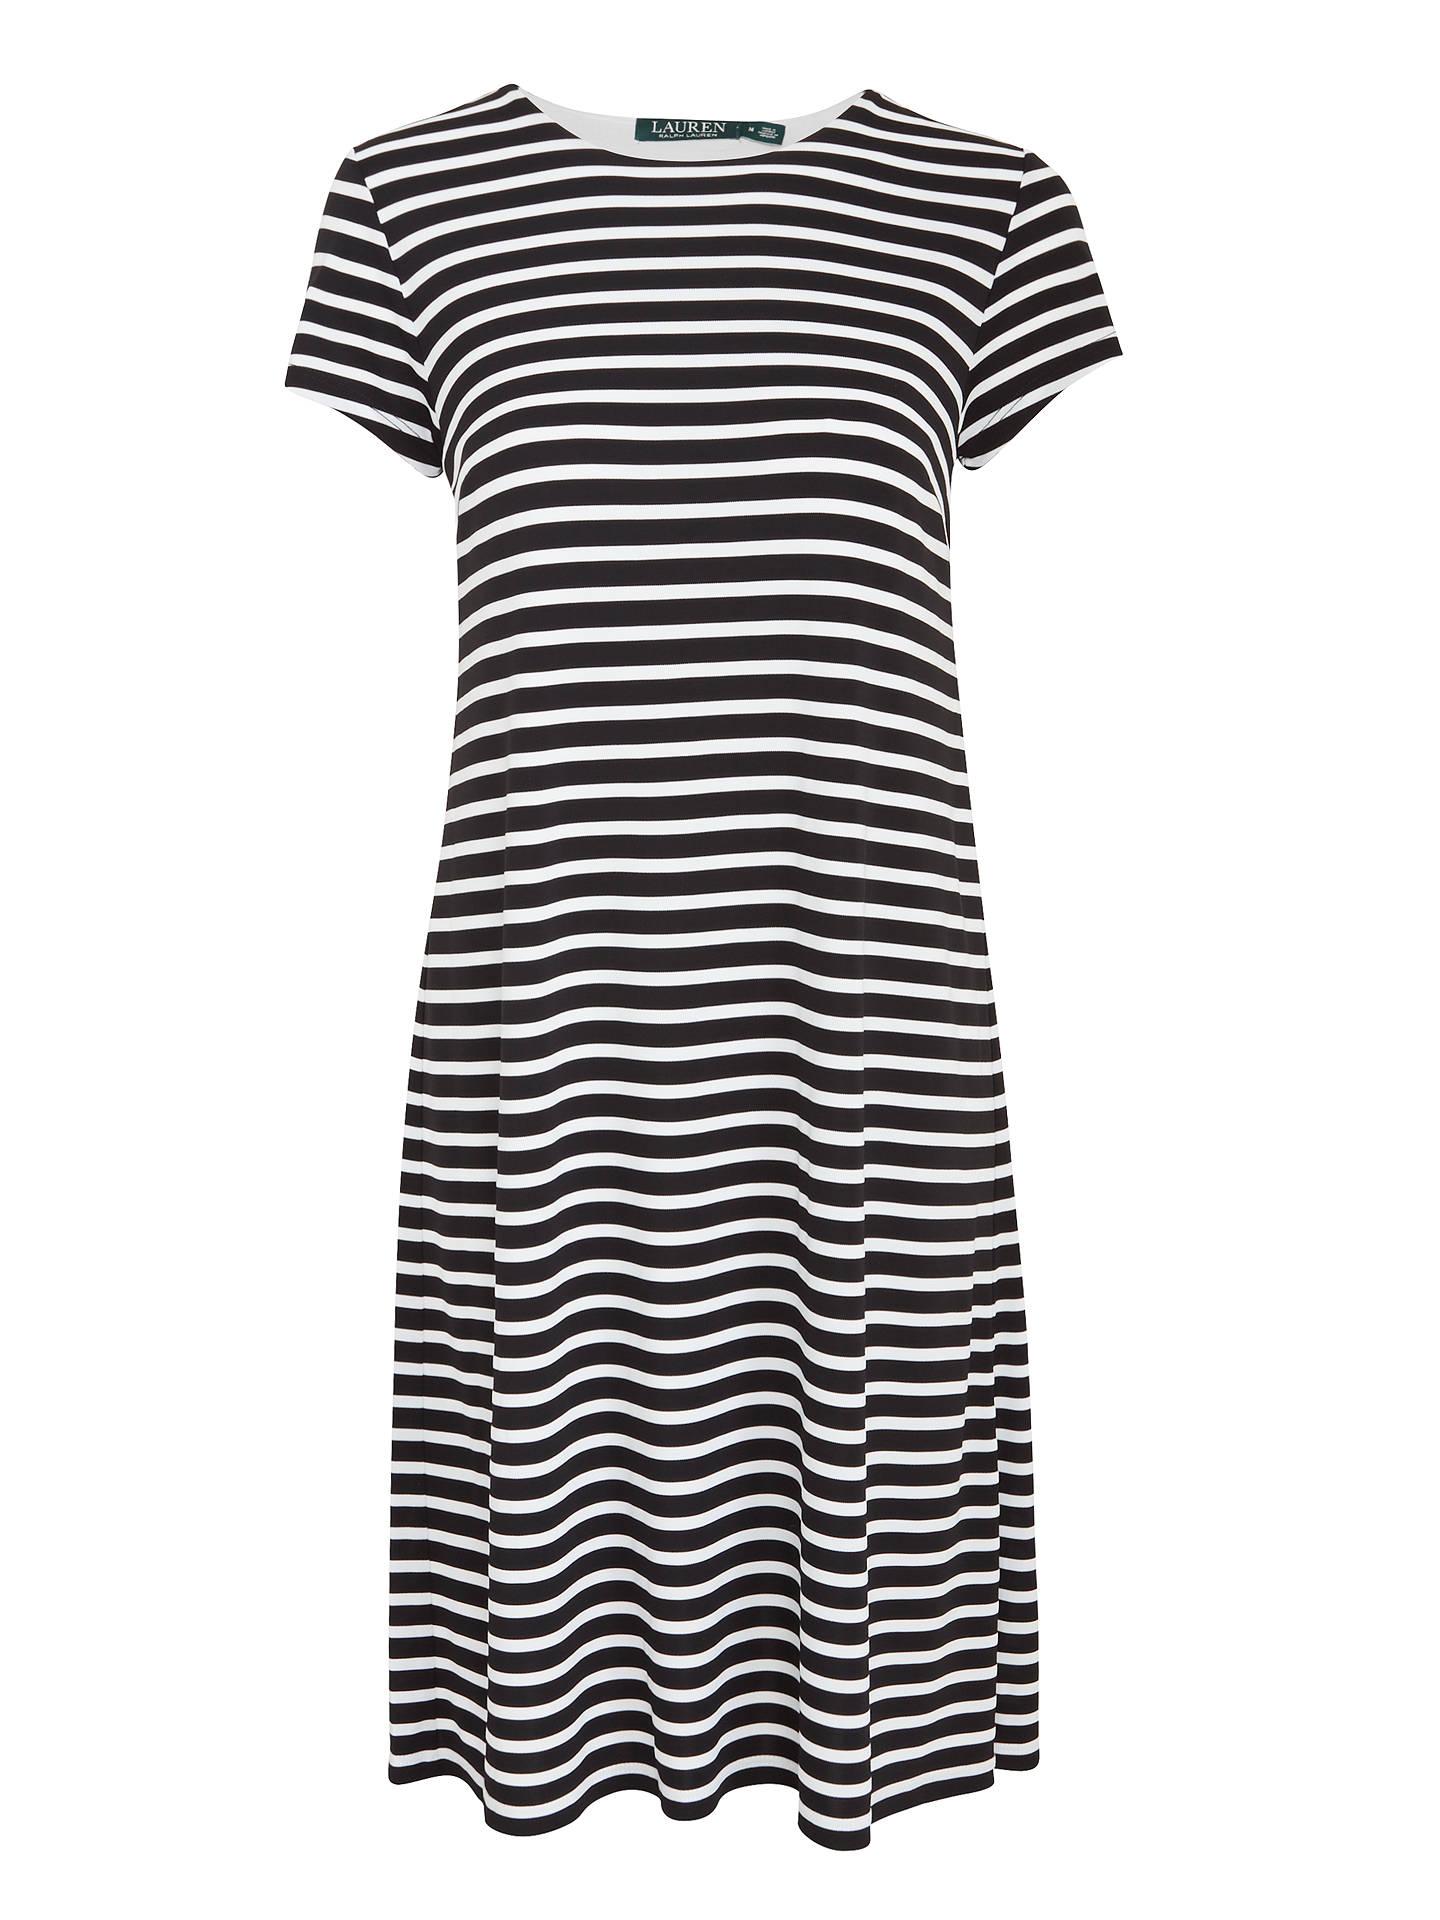 7f2553f719 Buy Lauren Ralph Lauren Hiwalani Stripe Jersey Dress, Black/White, XS  Online at